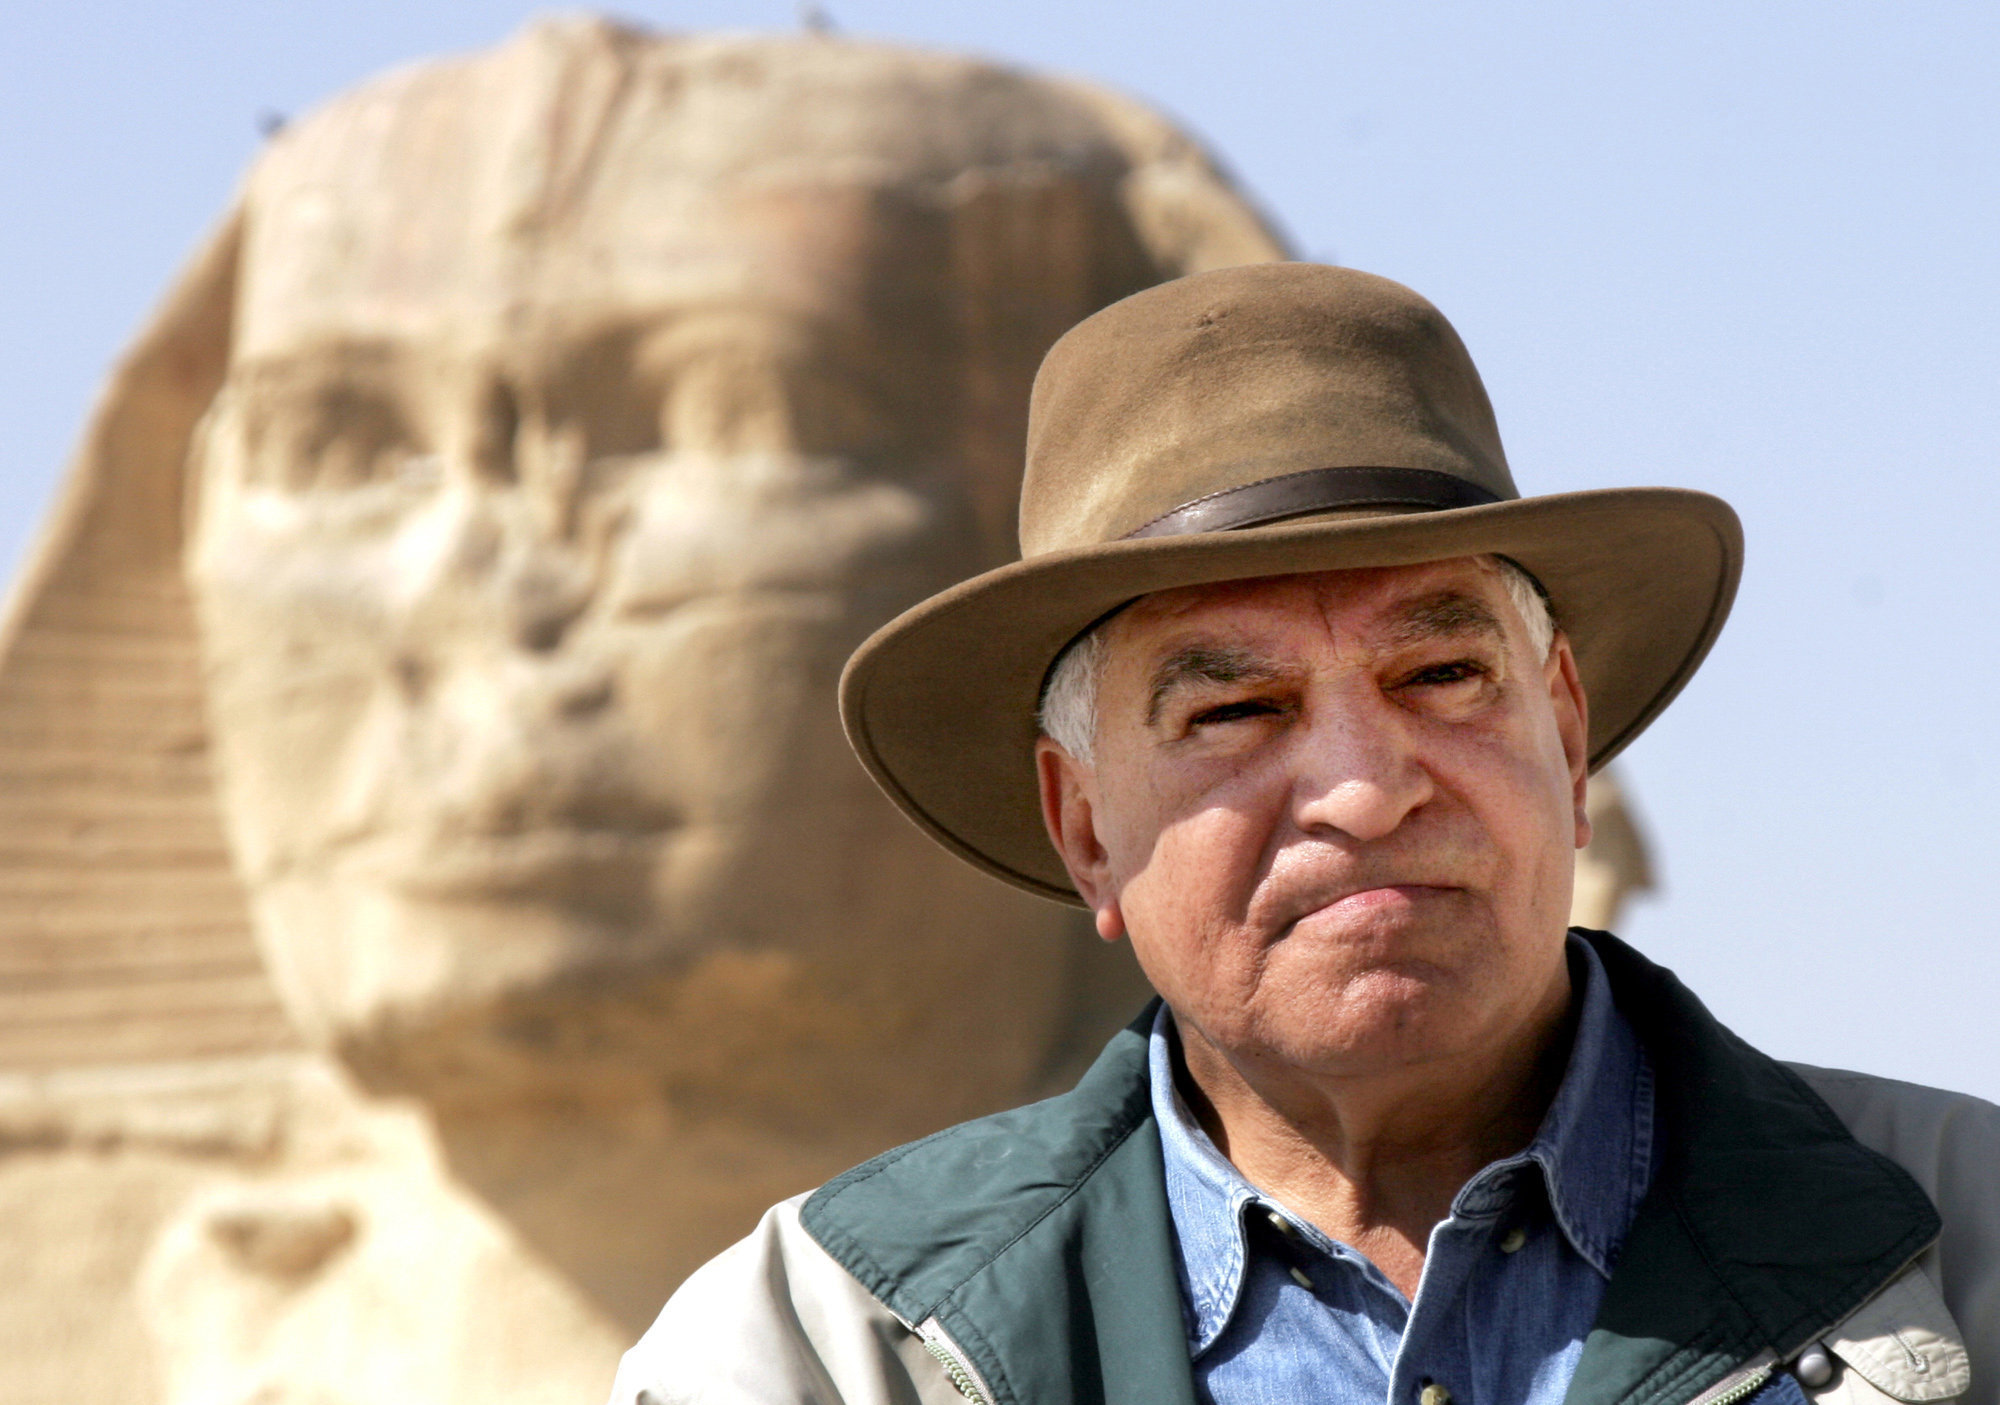 El famoso egiptólogo Zahi Hawass